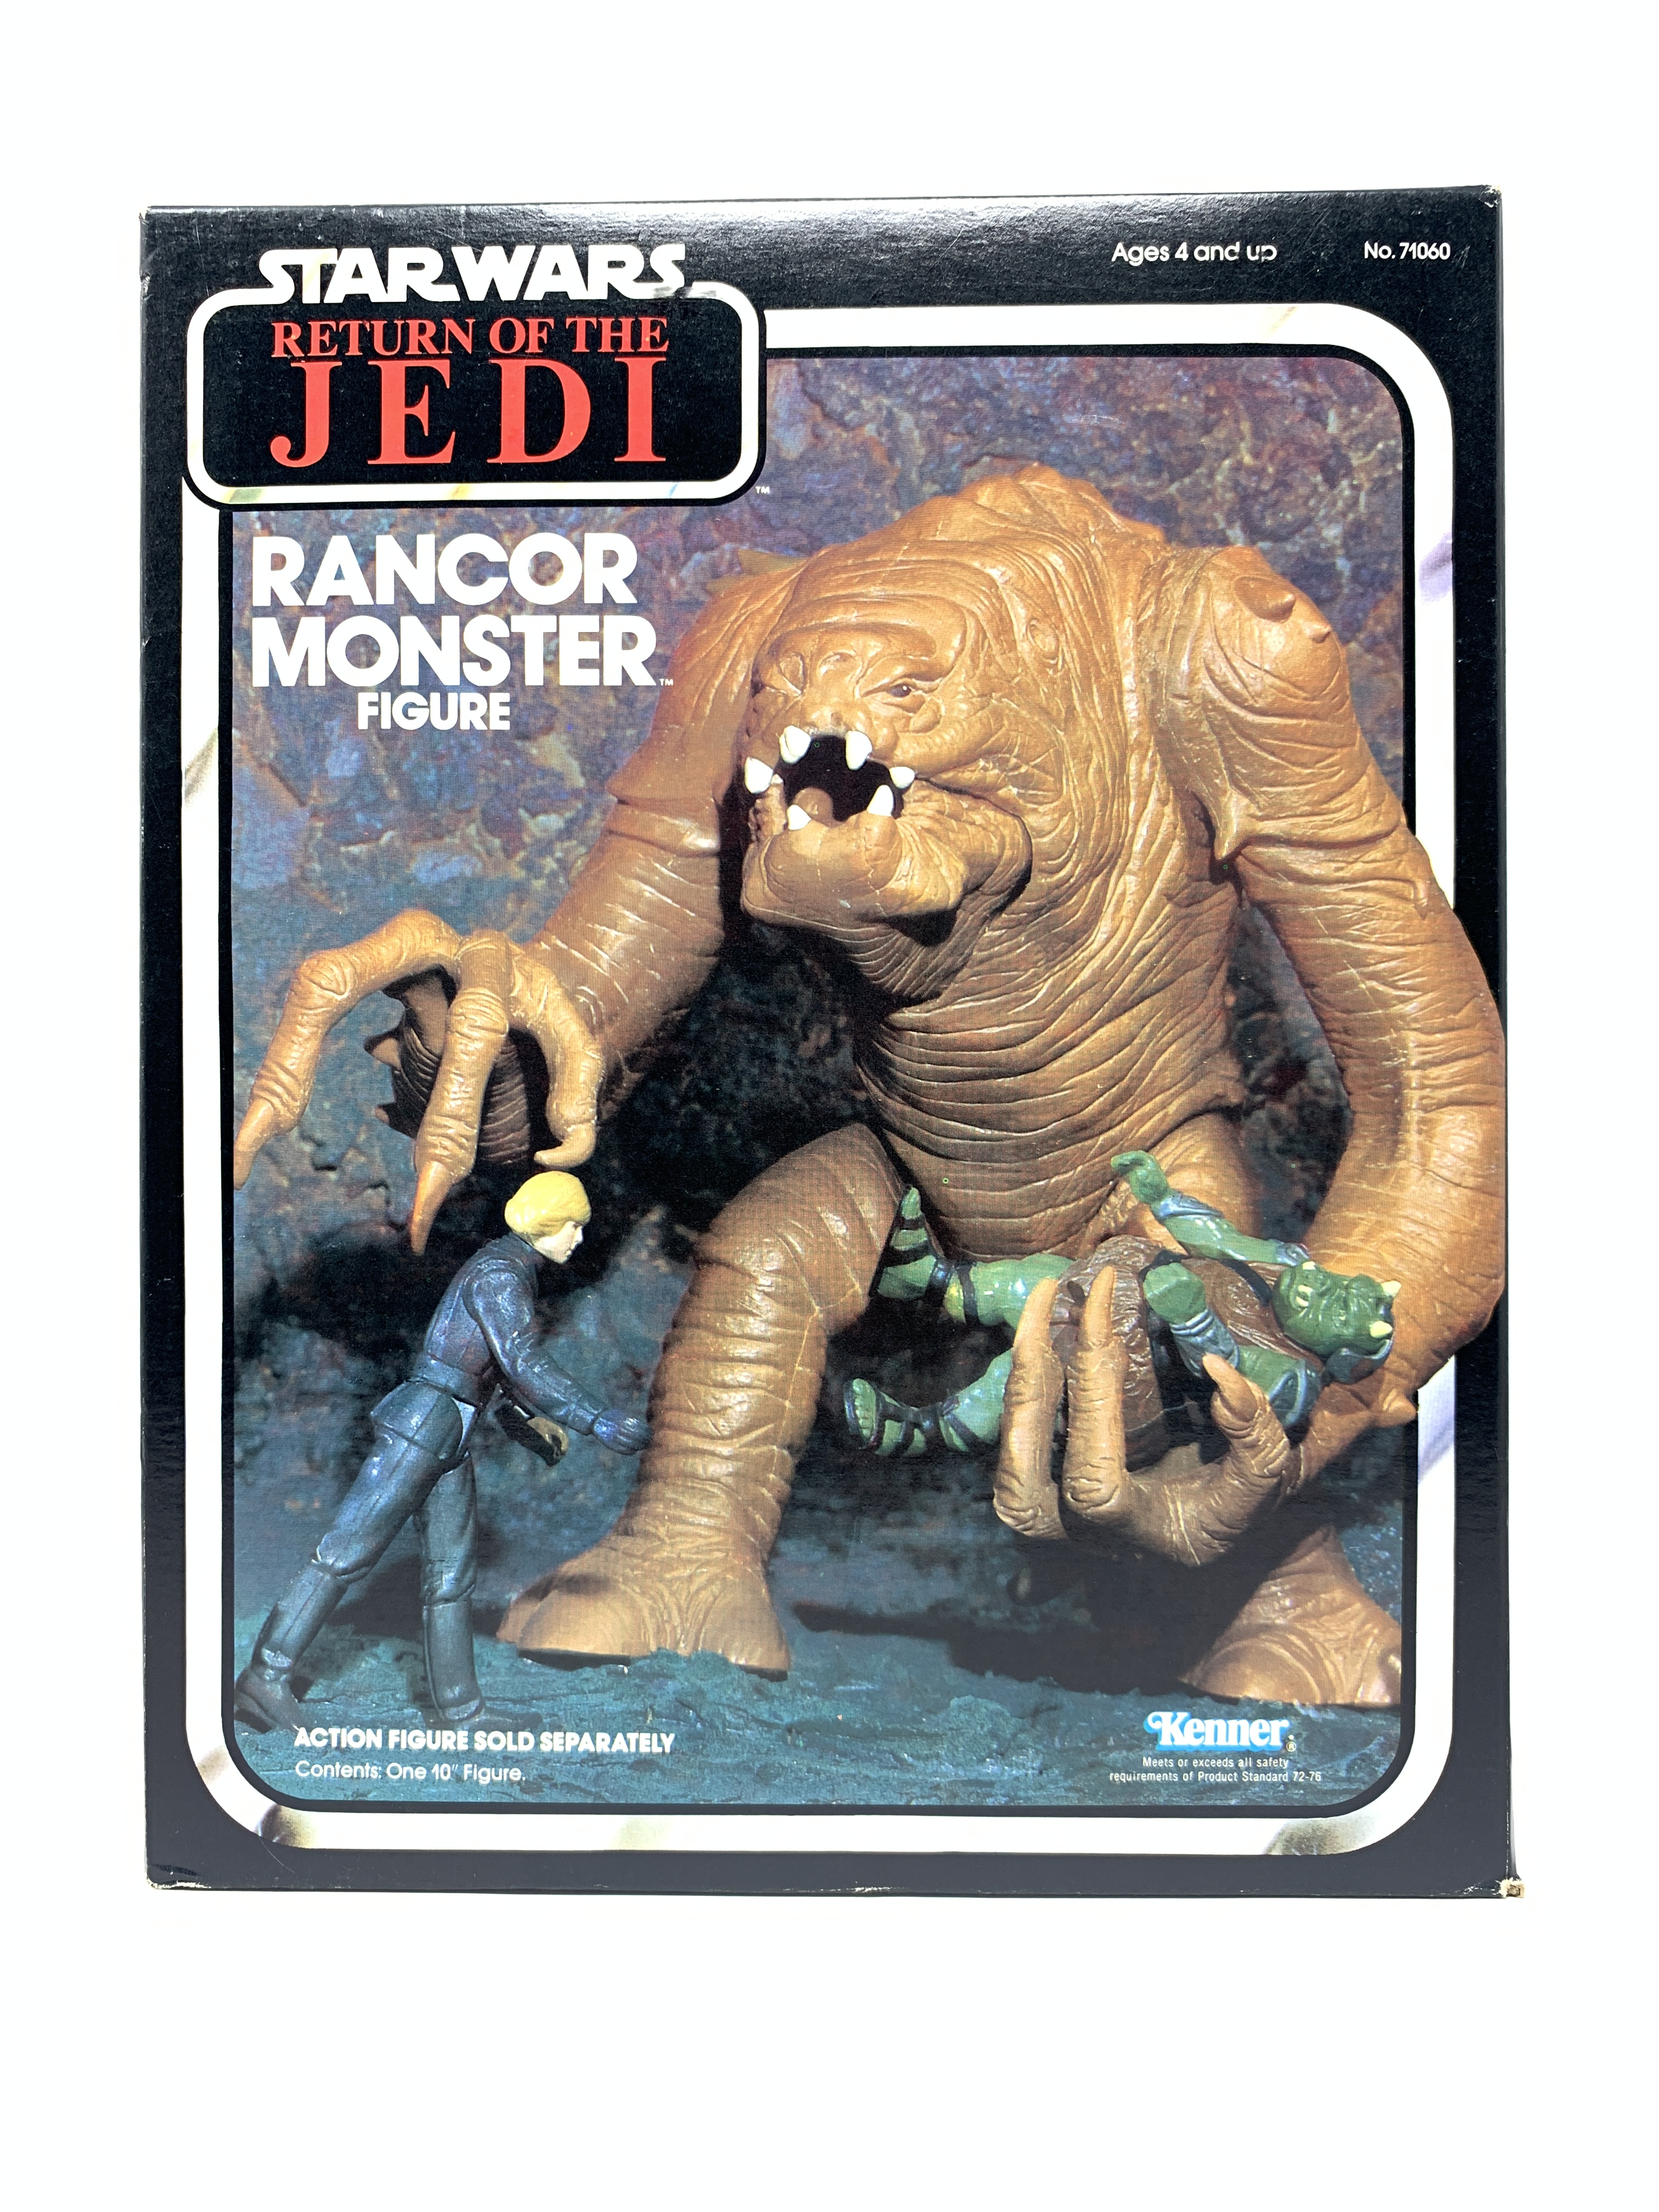 ROTJ Rancor Monster Front